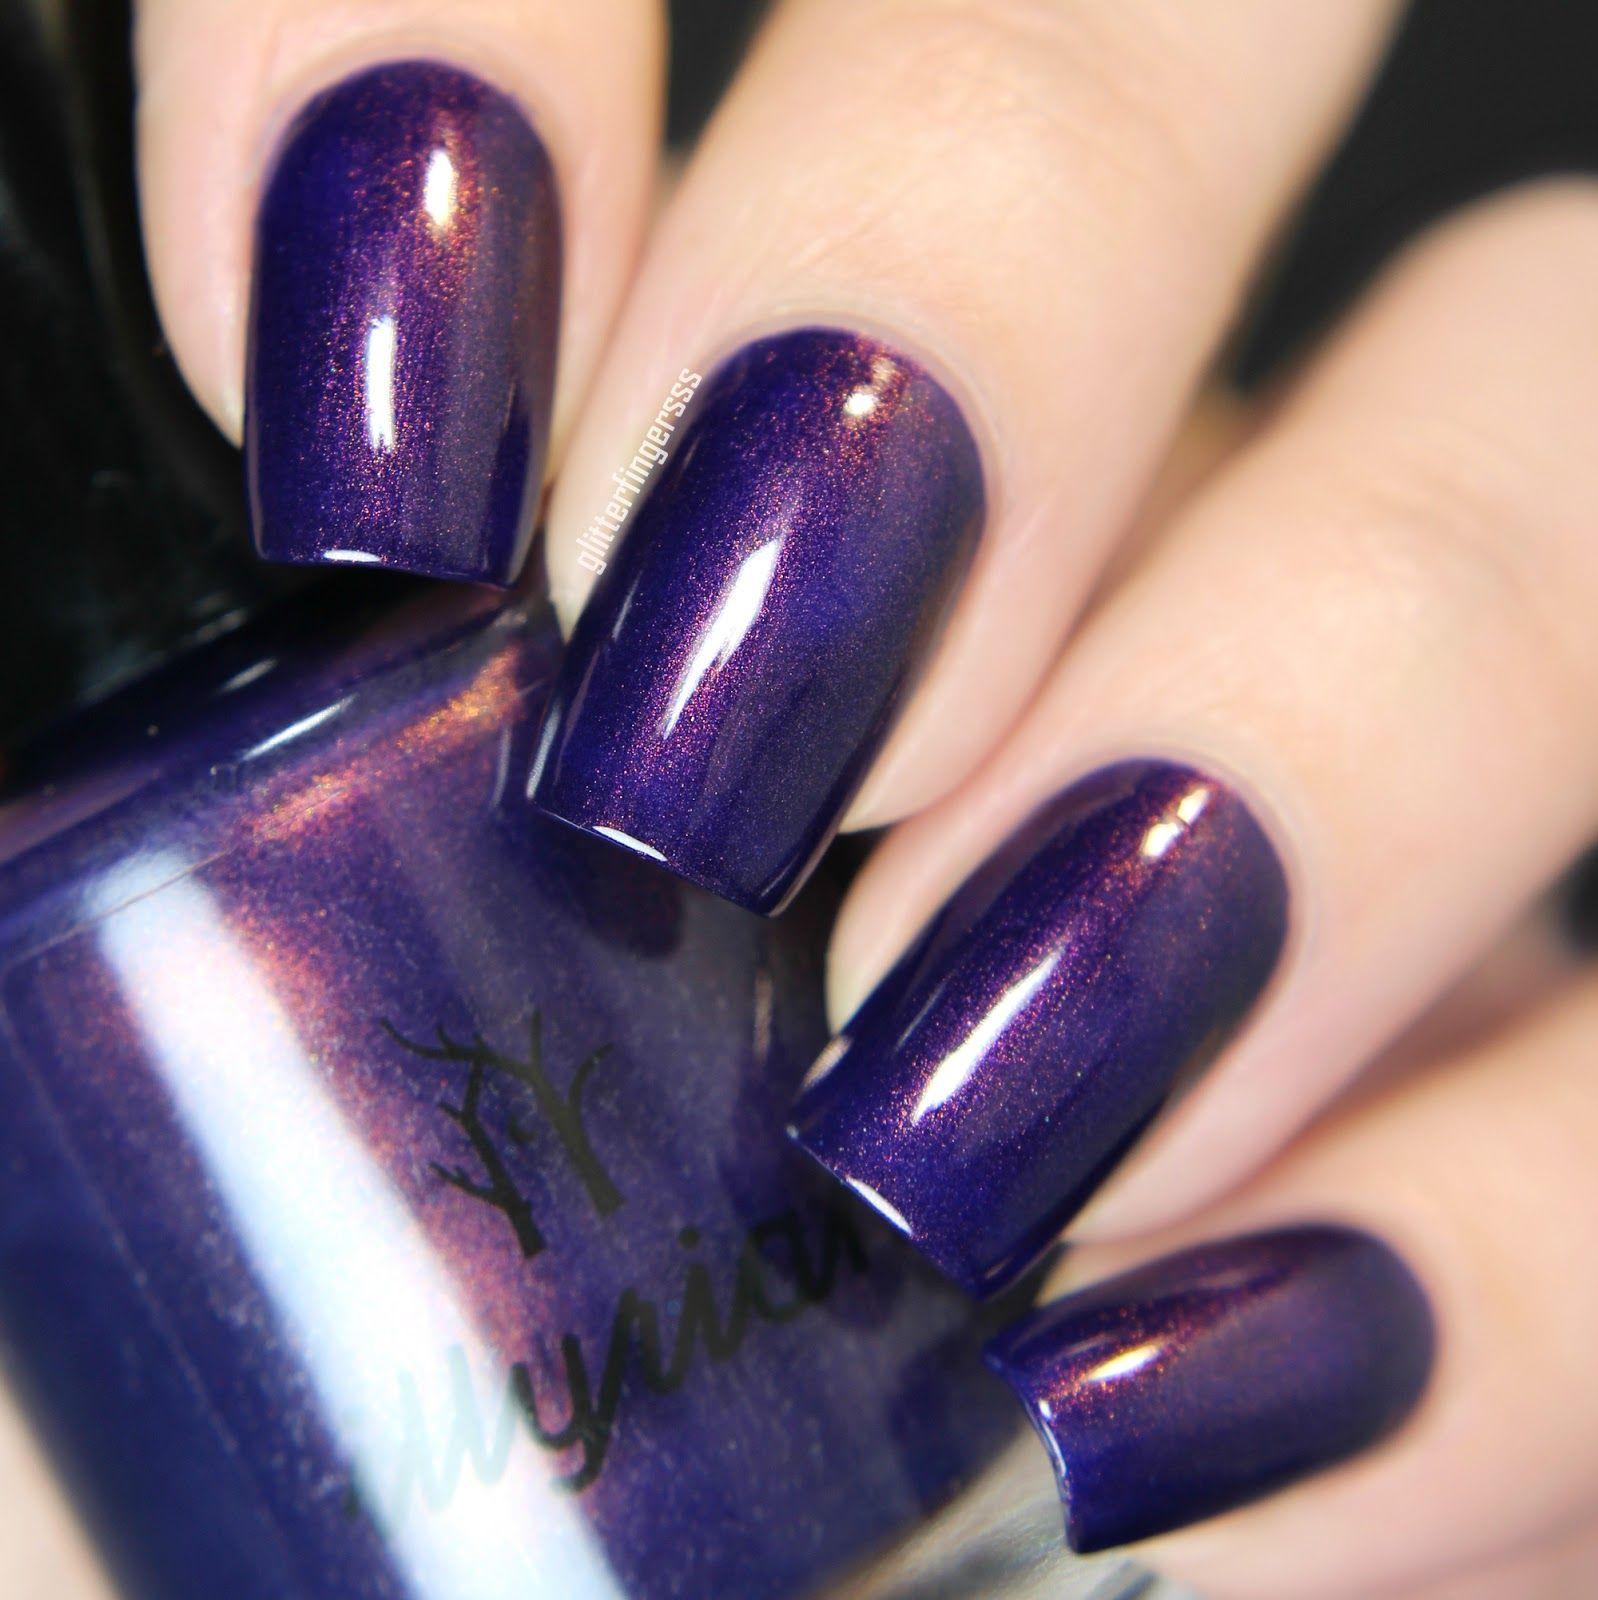 Illyrian Polish Darkness | magic at her fingertips | Pinterest ...